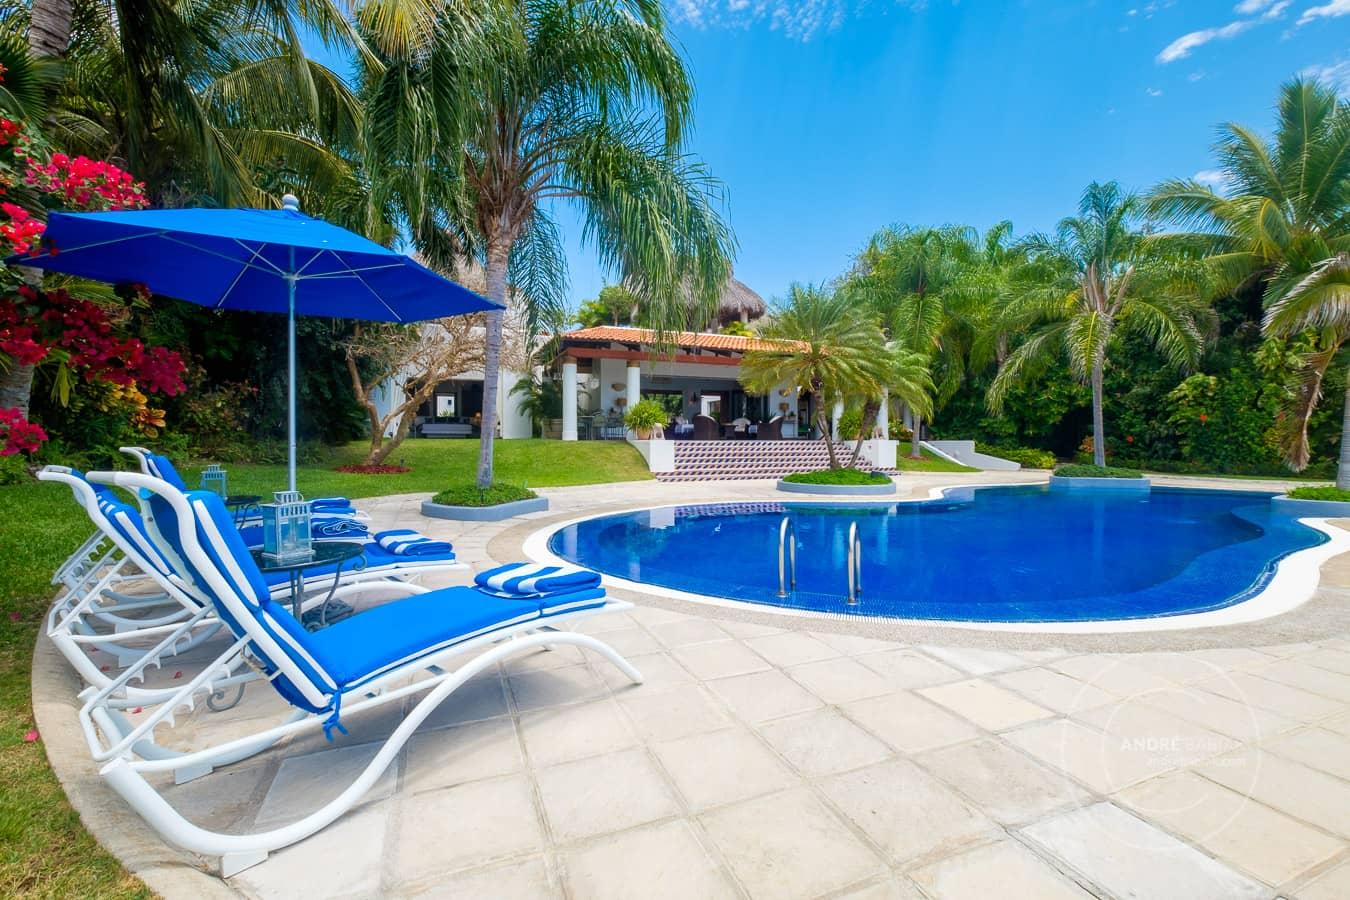 Architecture And Real Estate Photographer Puerto Vallarta 1